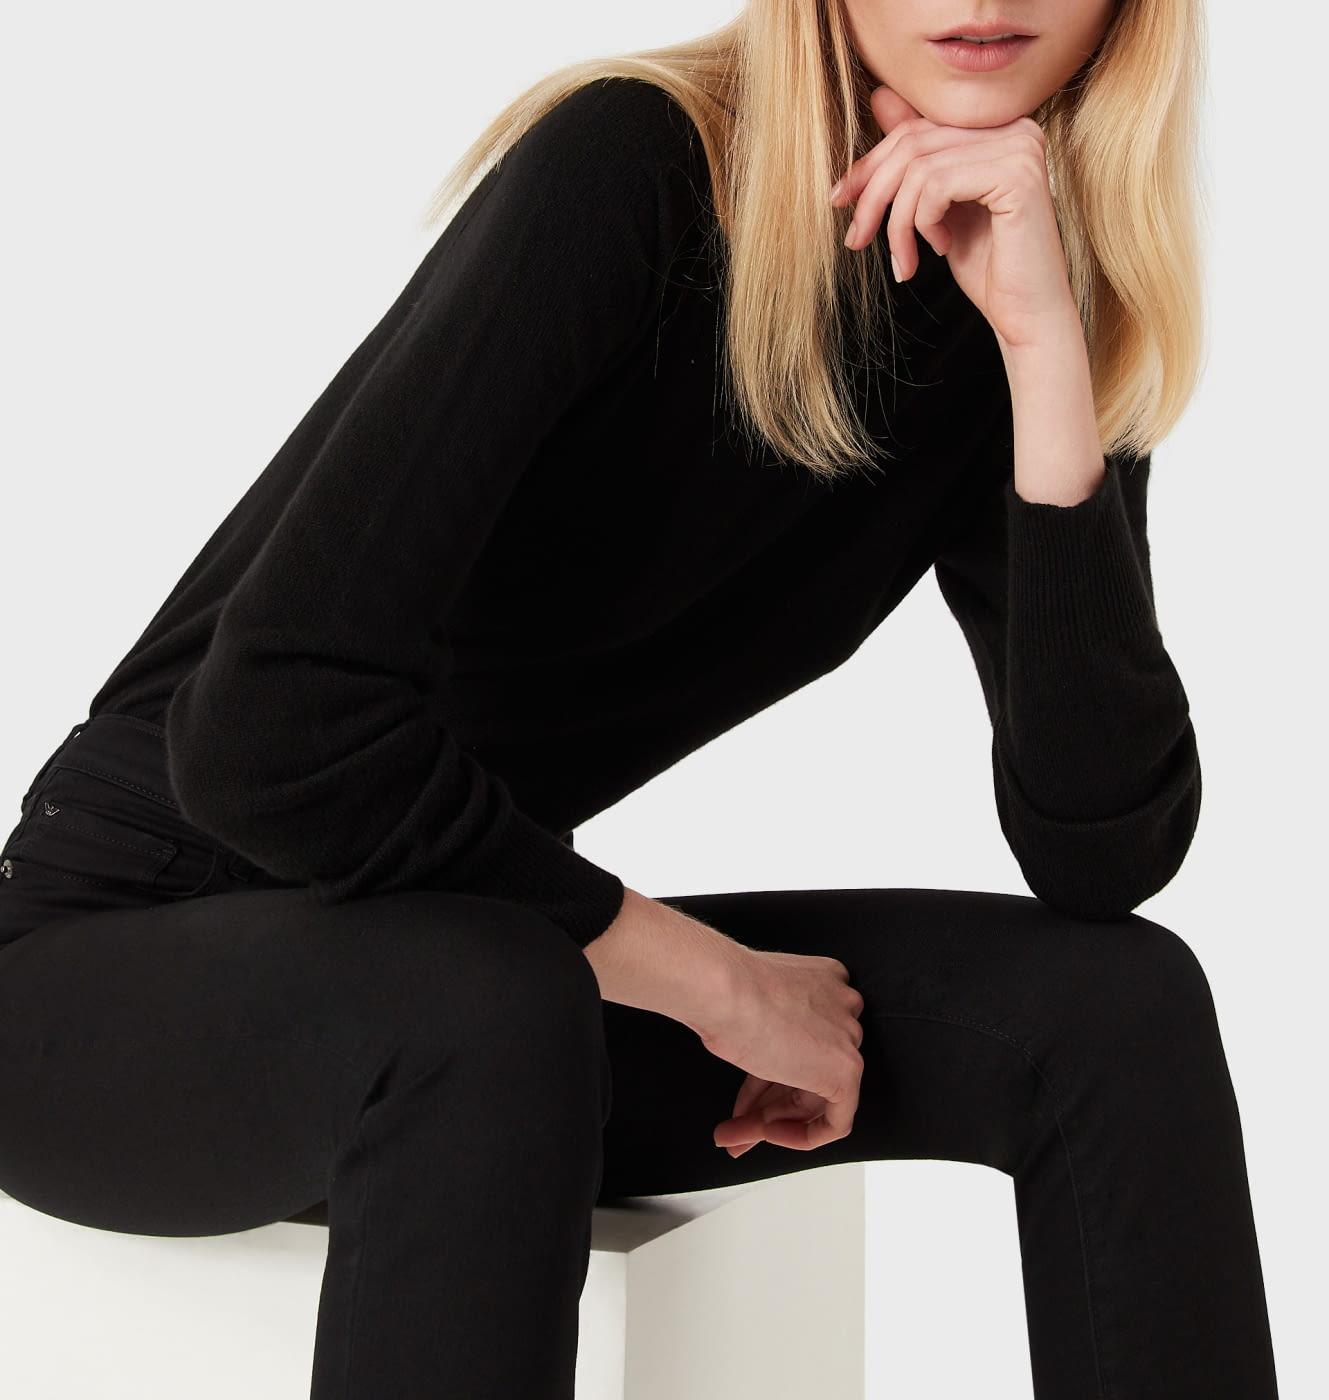 EMPORIO ARMANI pantalón color negro